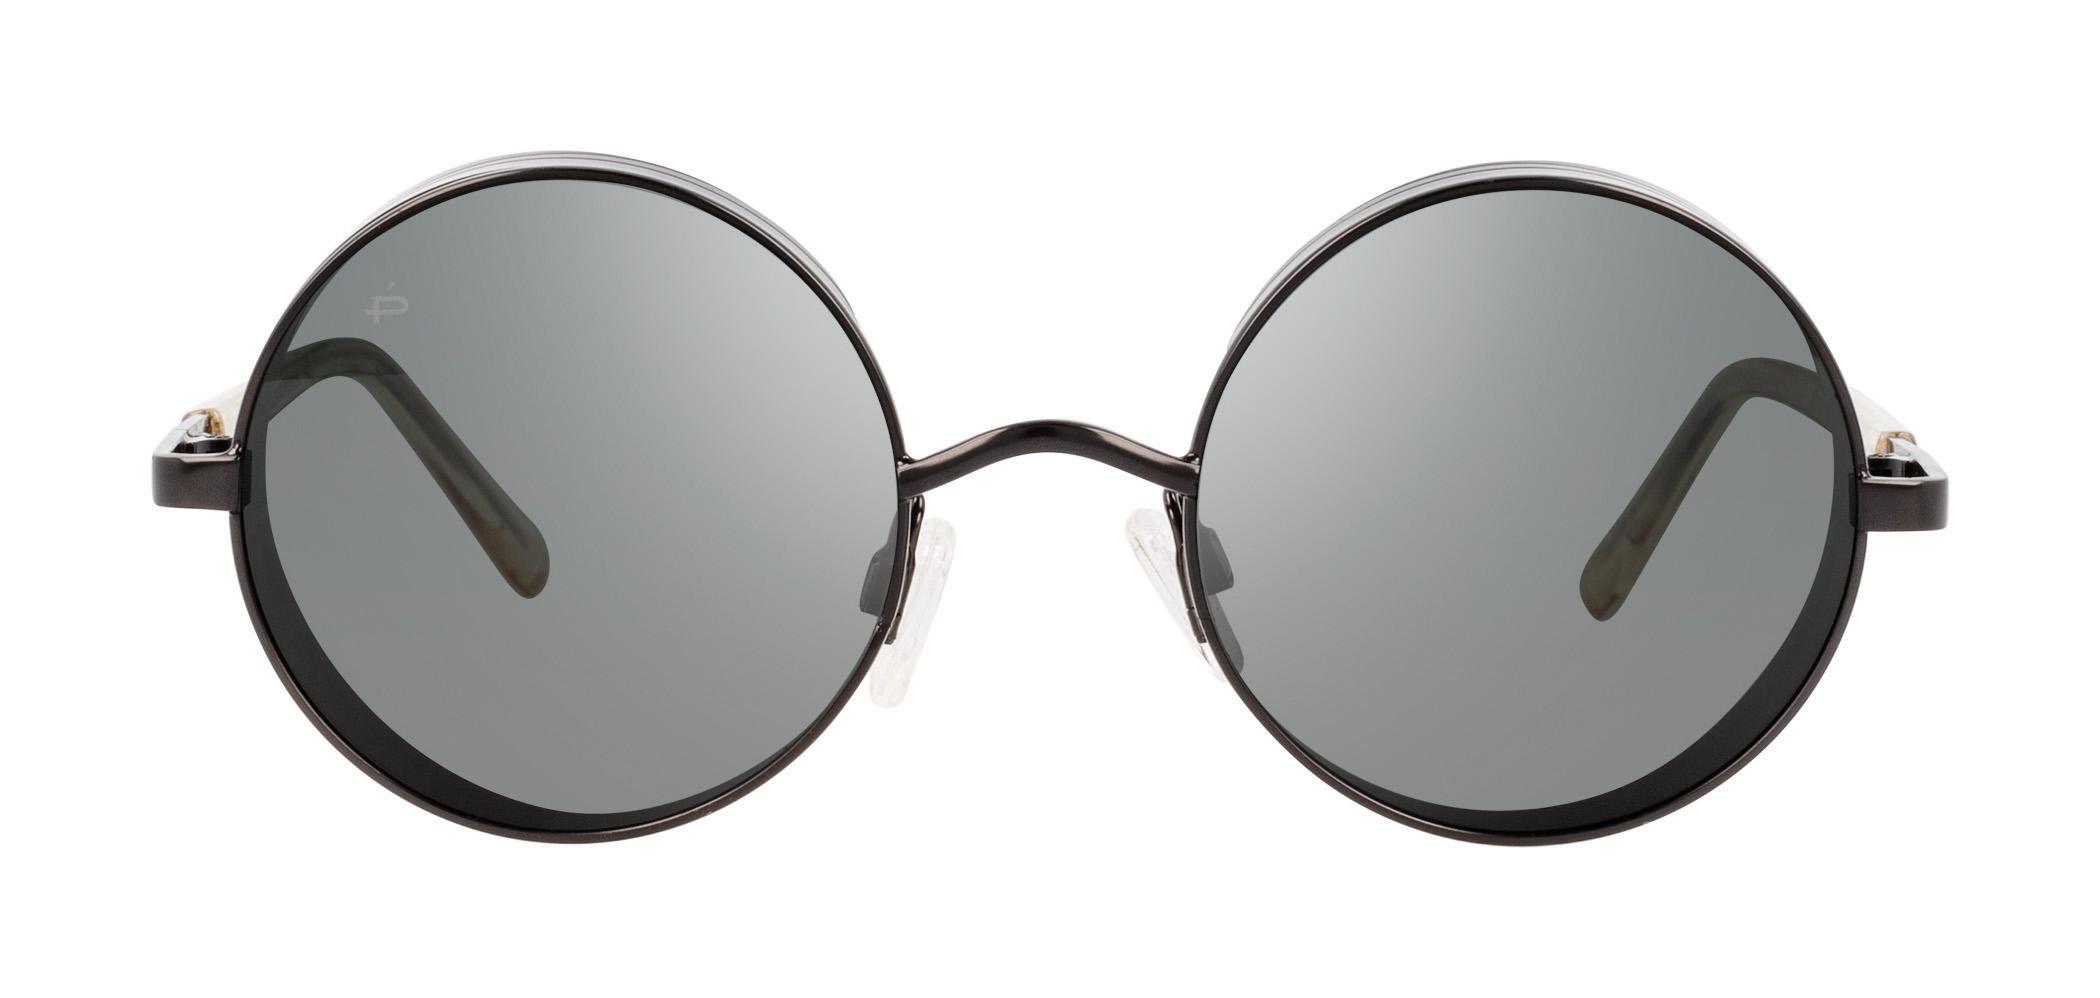 prive-revaux-sunglasses-ss-21-edit